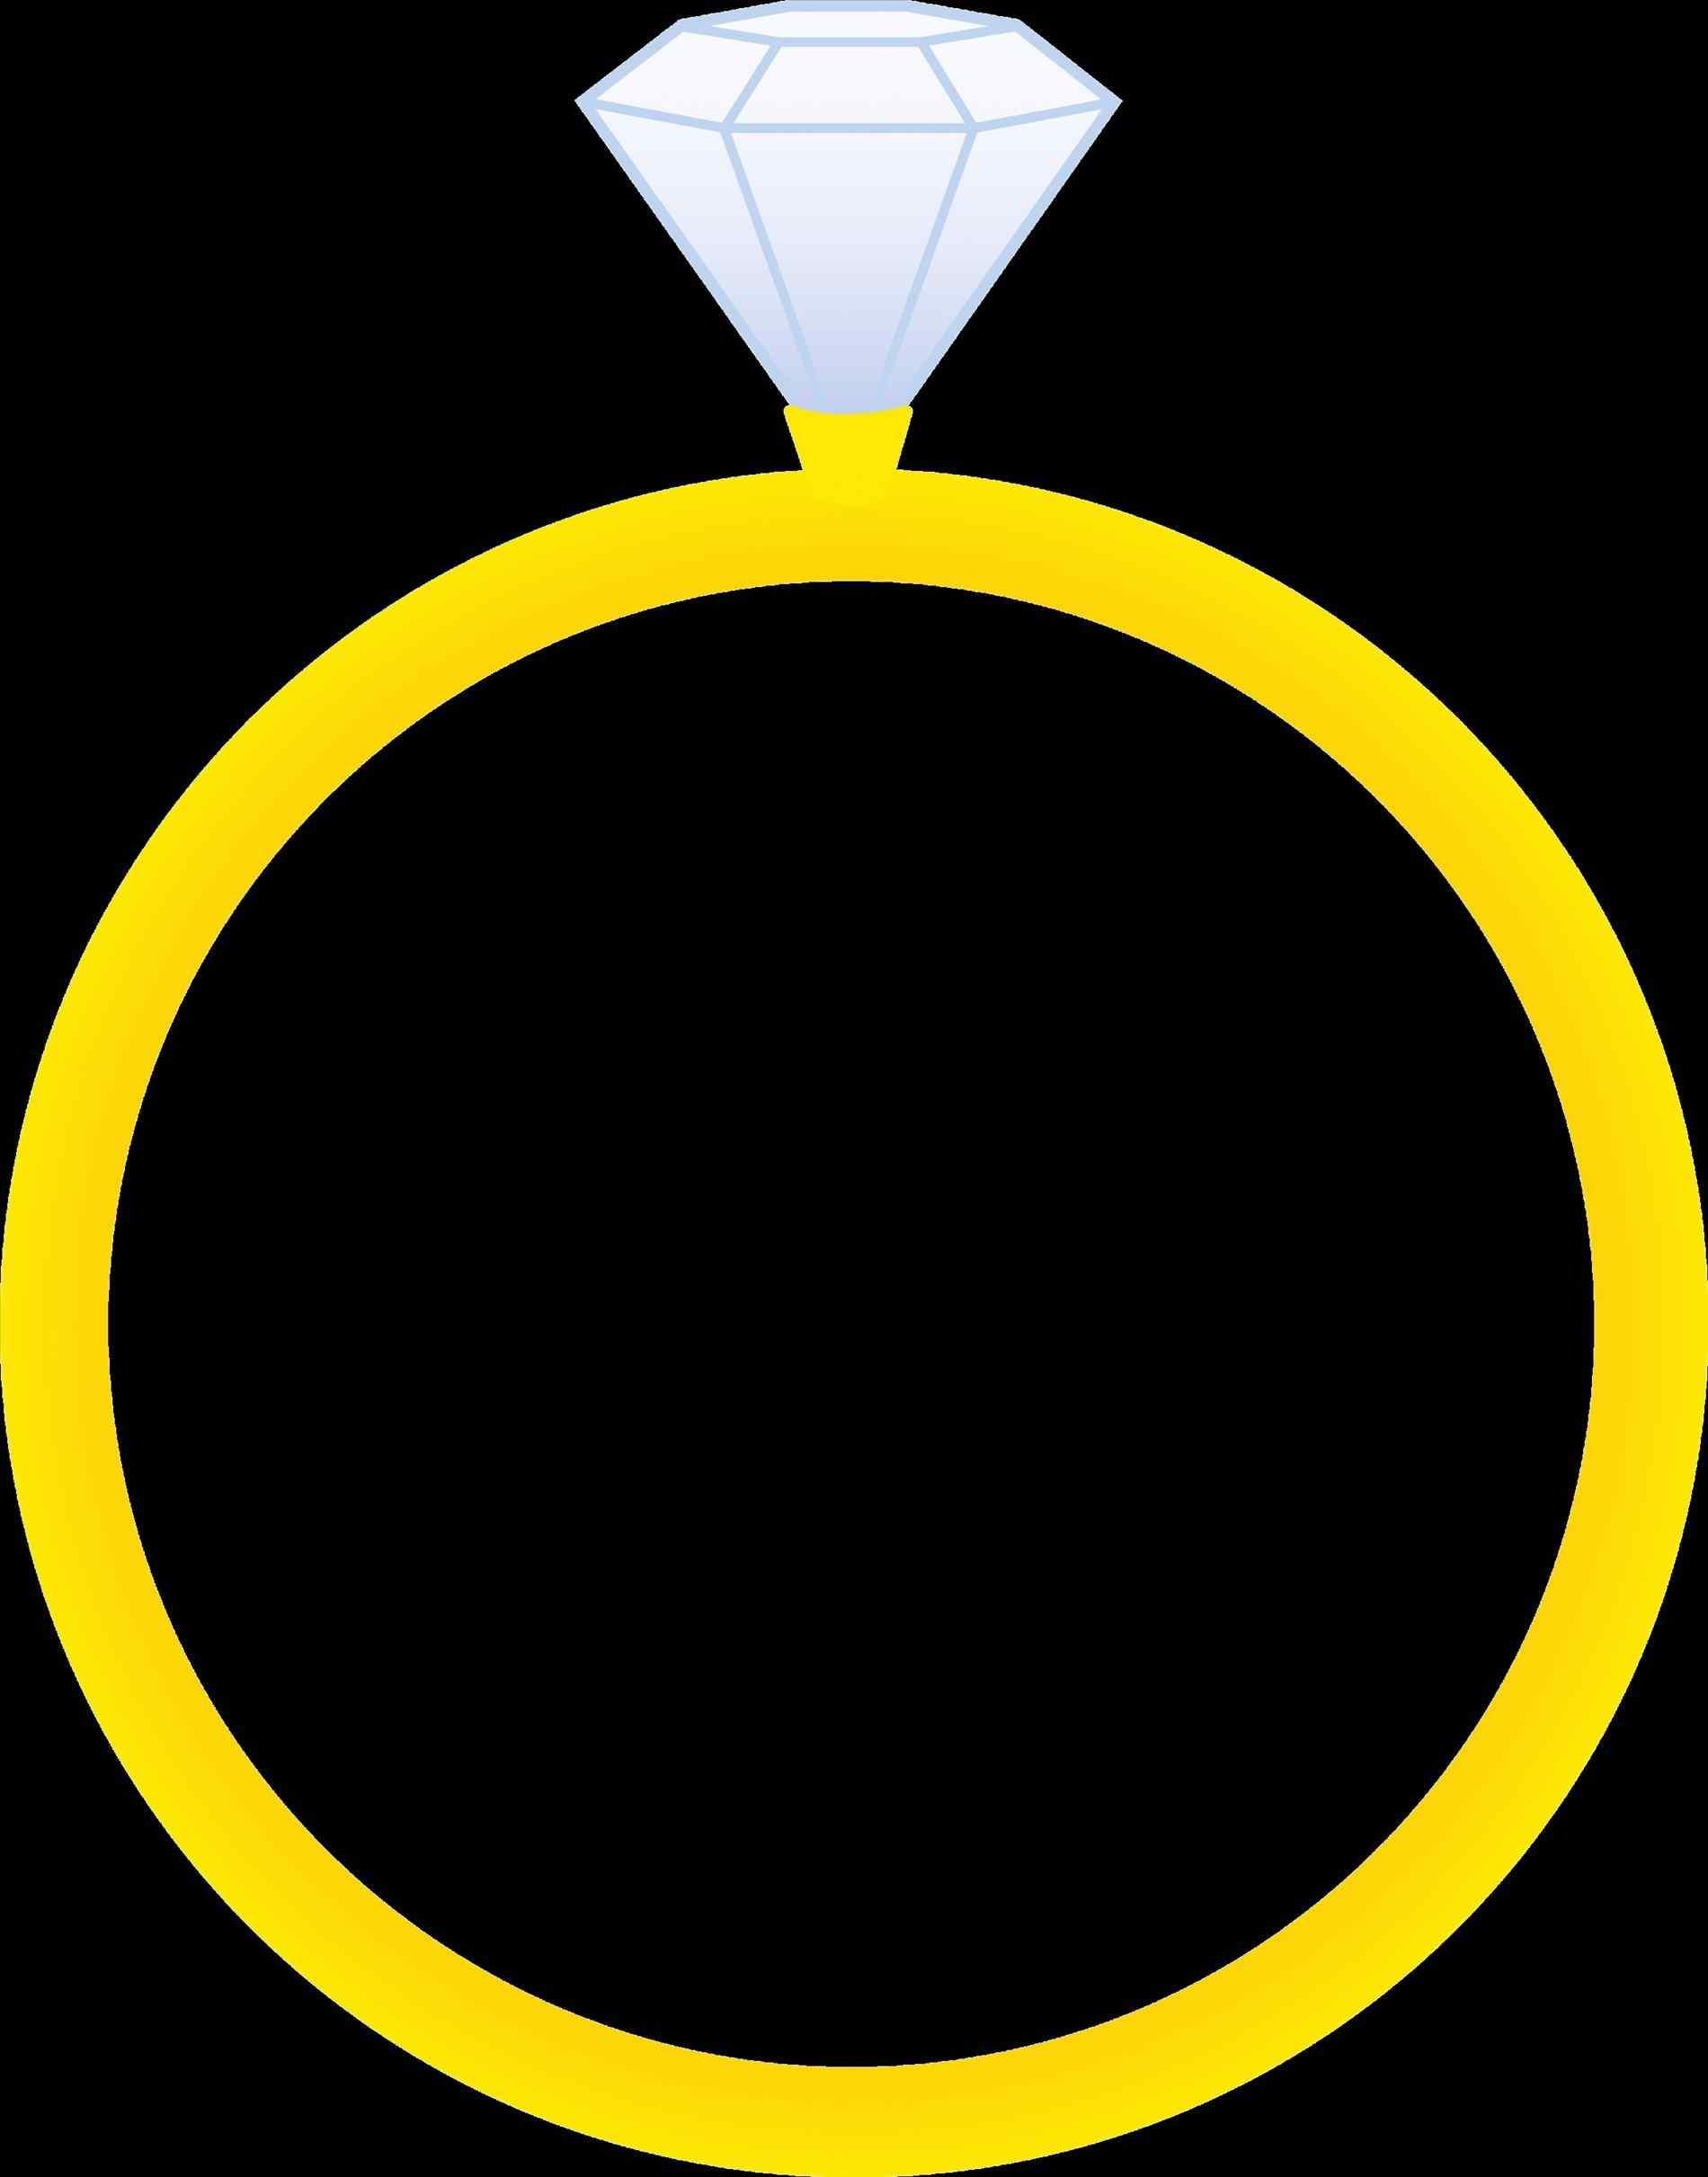 1900x2422 Panda Rhpandacom Engagement Diamond Ring Clipart Black